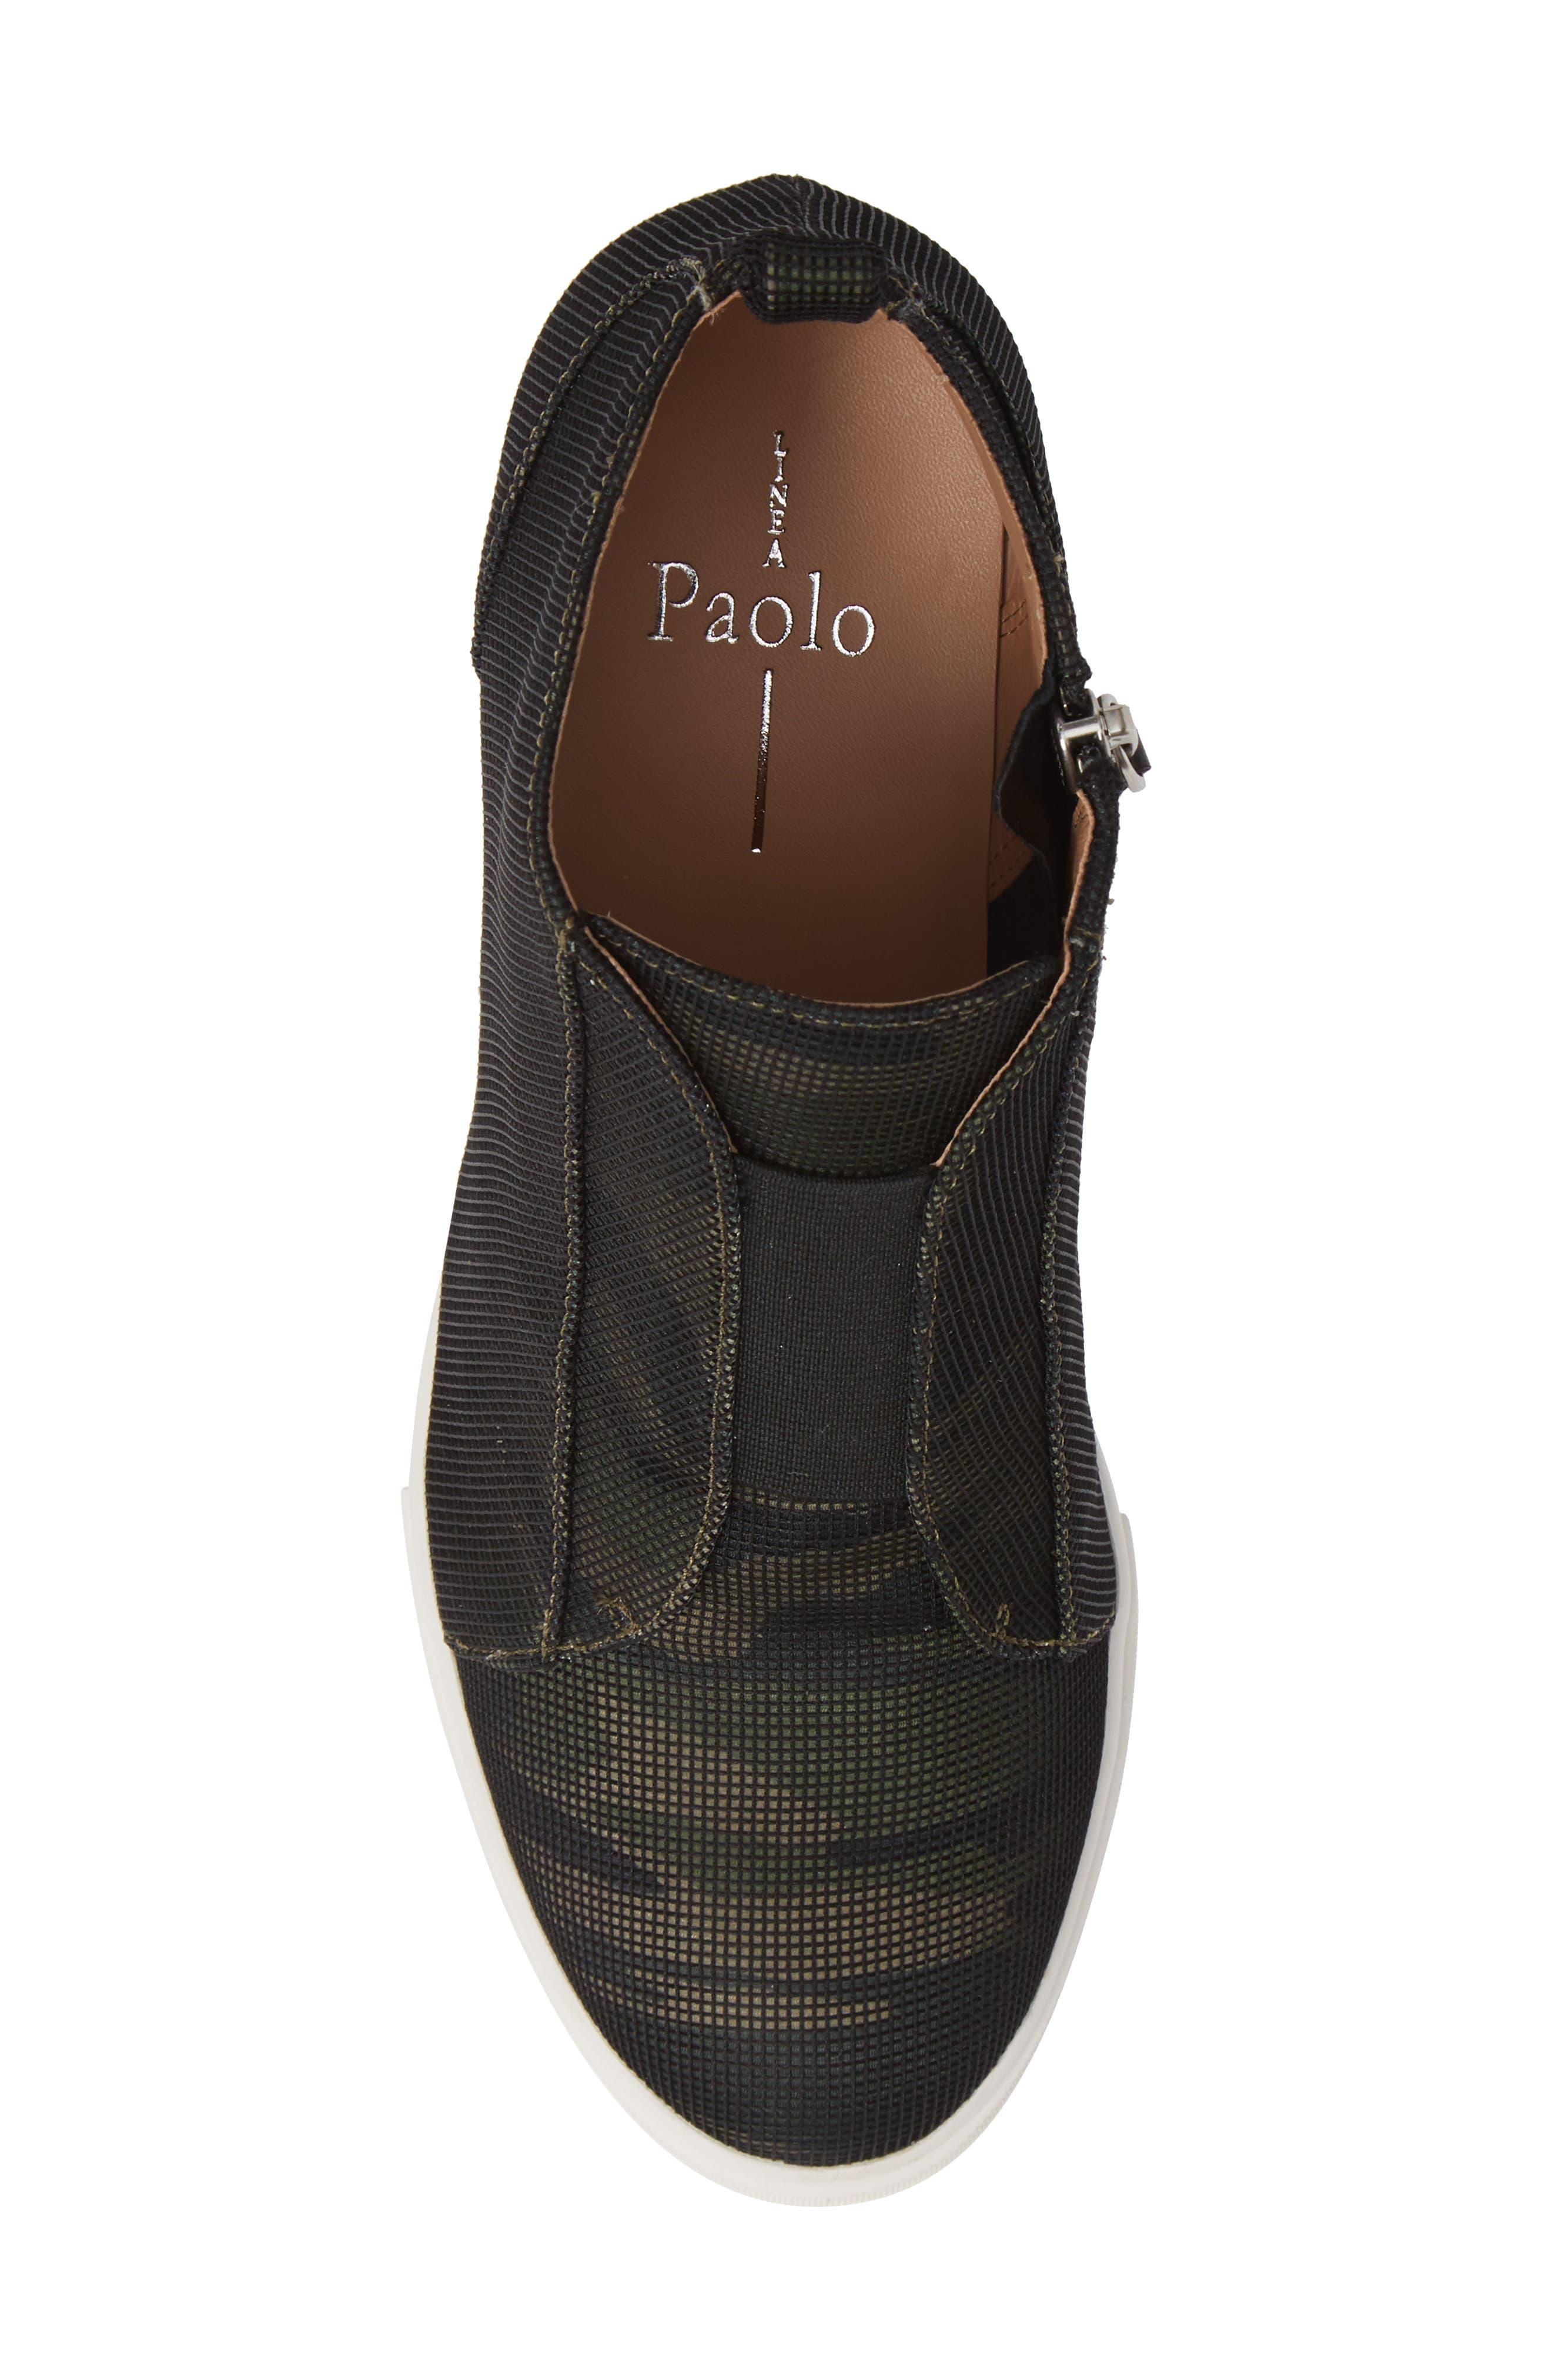 'Felicia' Wedge Bootie,                             Alternate thumbnail 6, color,                             Camo Fabric